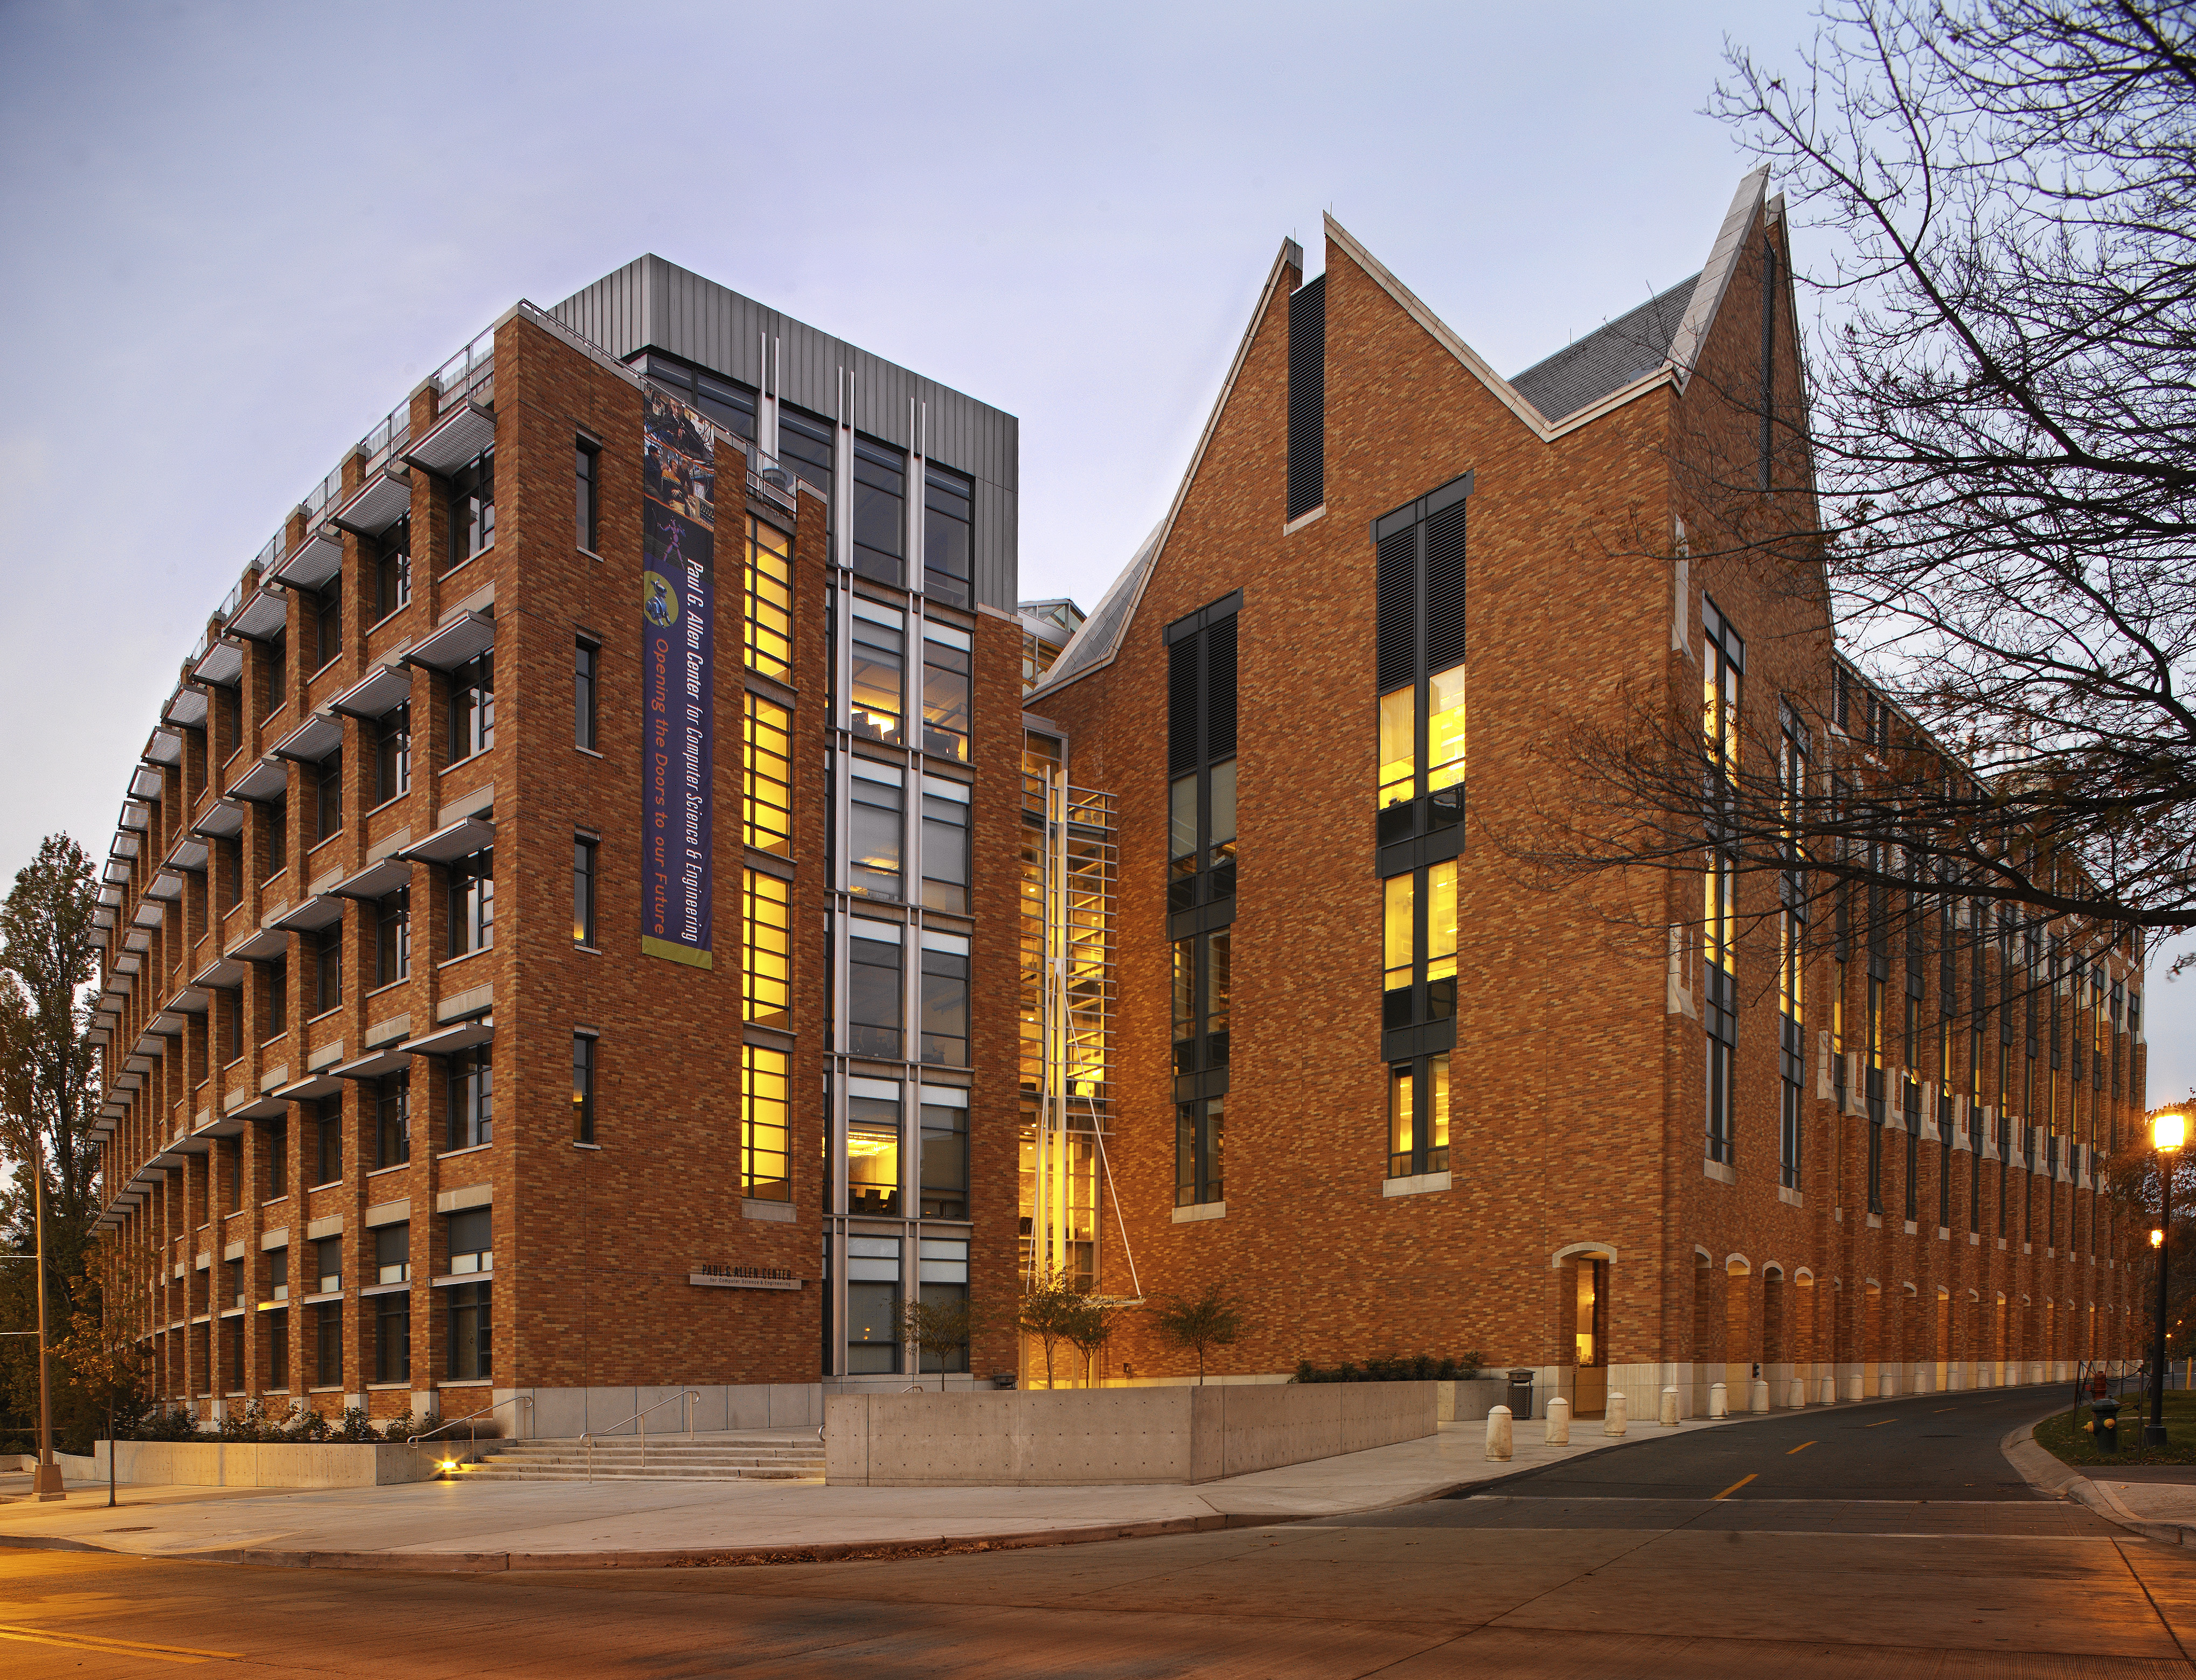 Ed LaCasse Photographs of the Paul G. Allen Center for ...